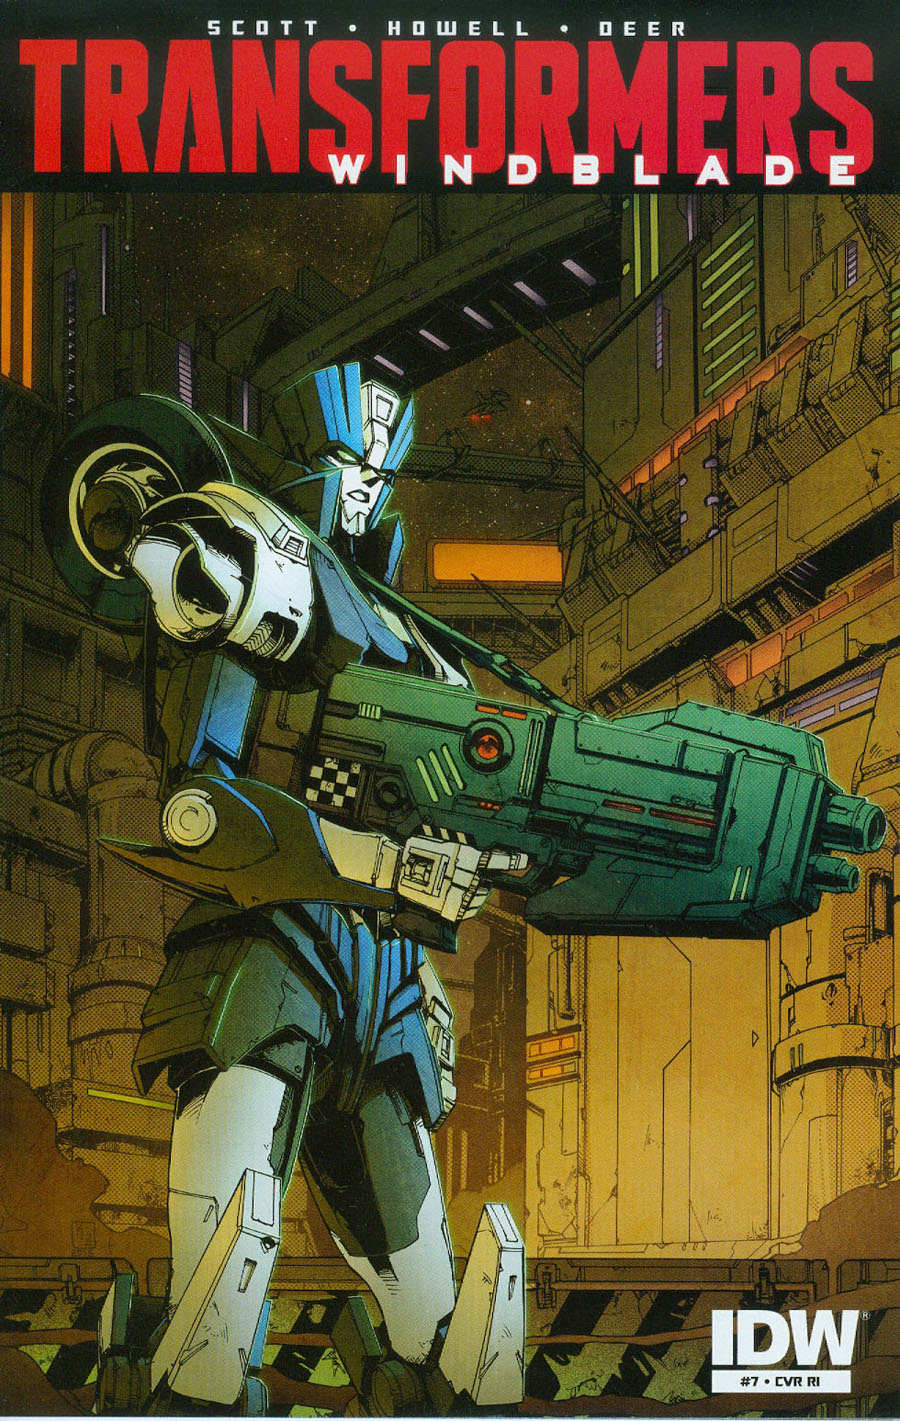 Transformers Windblade Vol 2 #7 Cover C Incentive Kei Zama Variant Cover